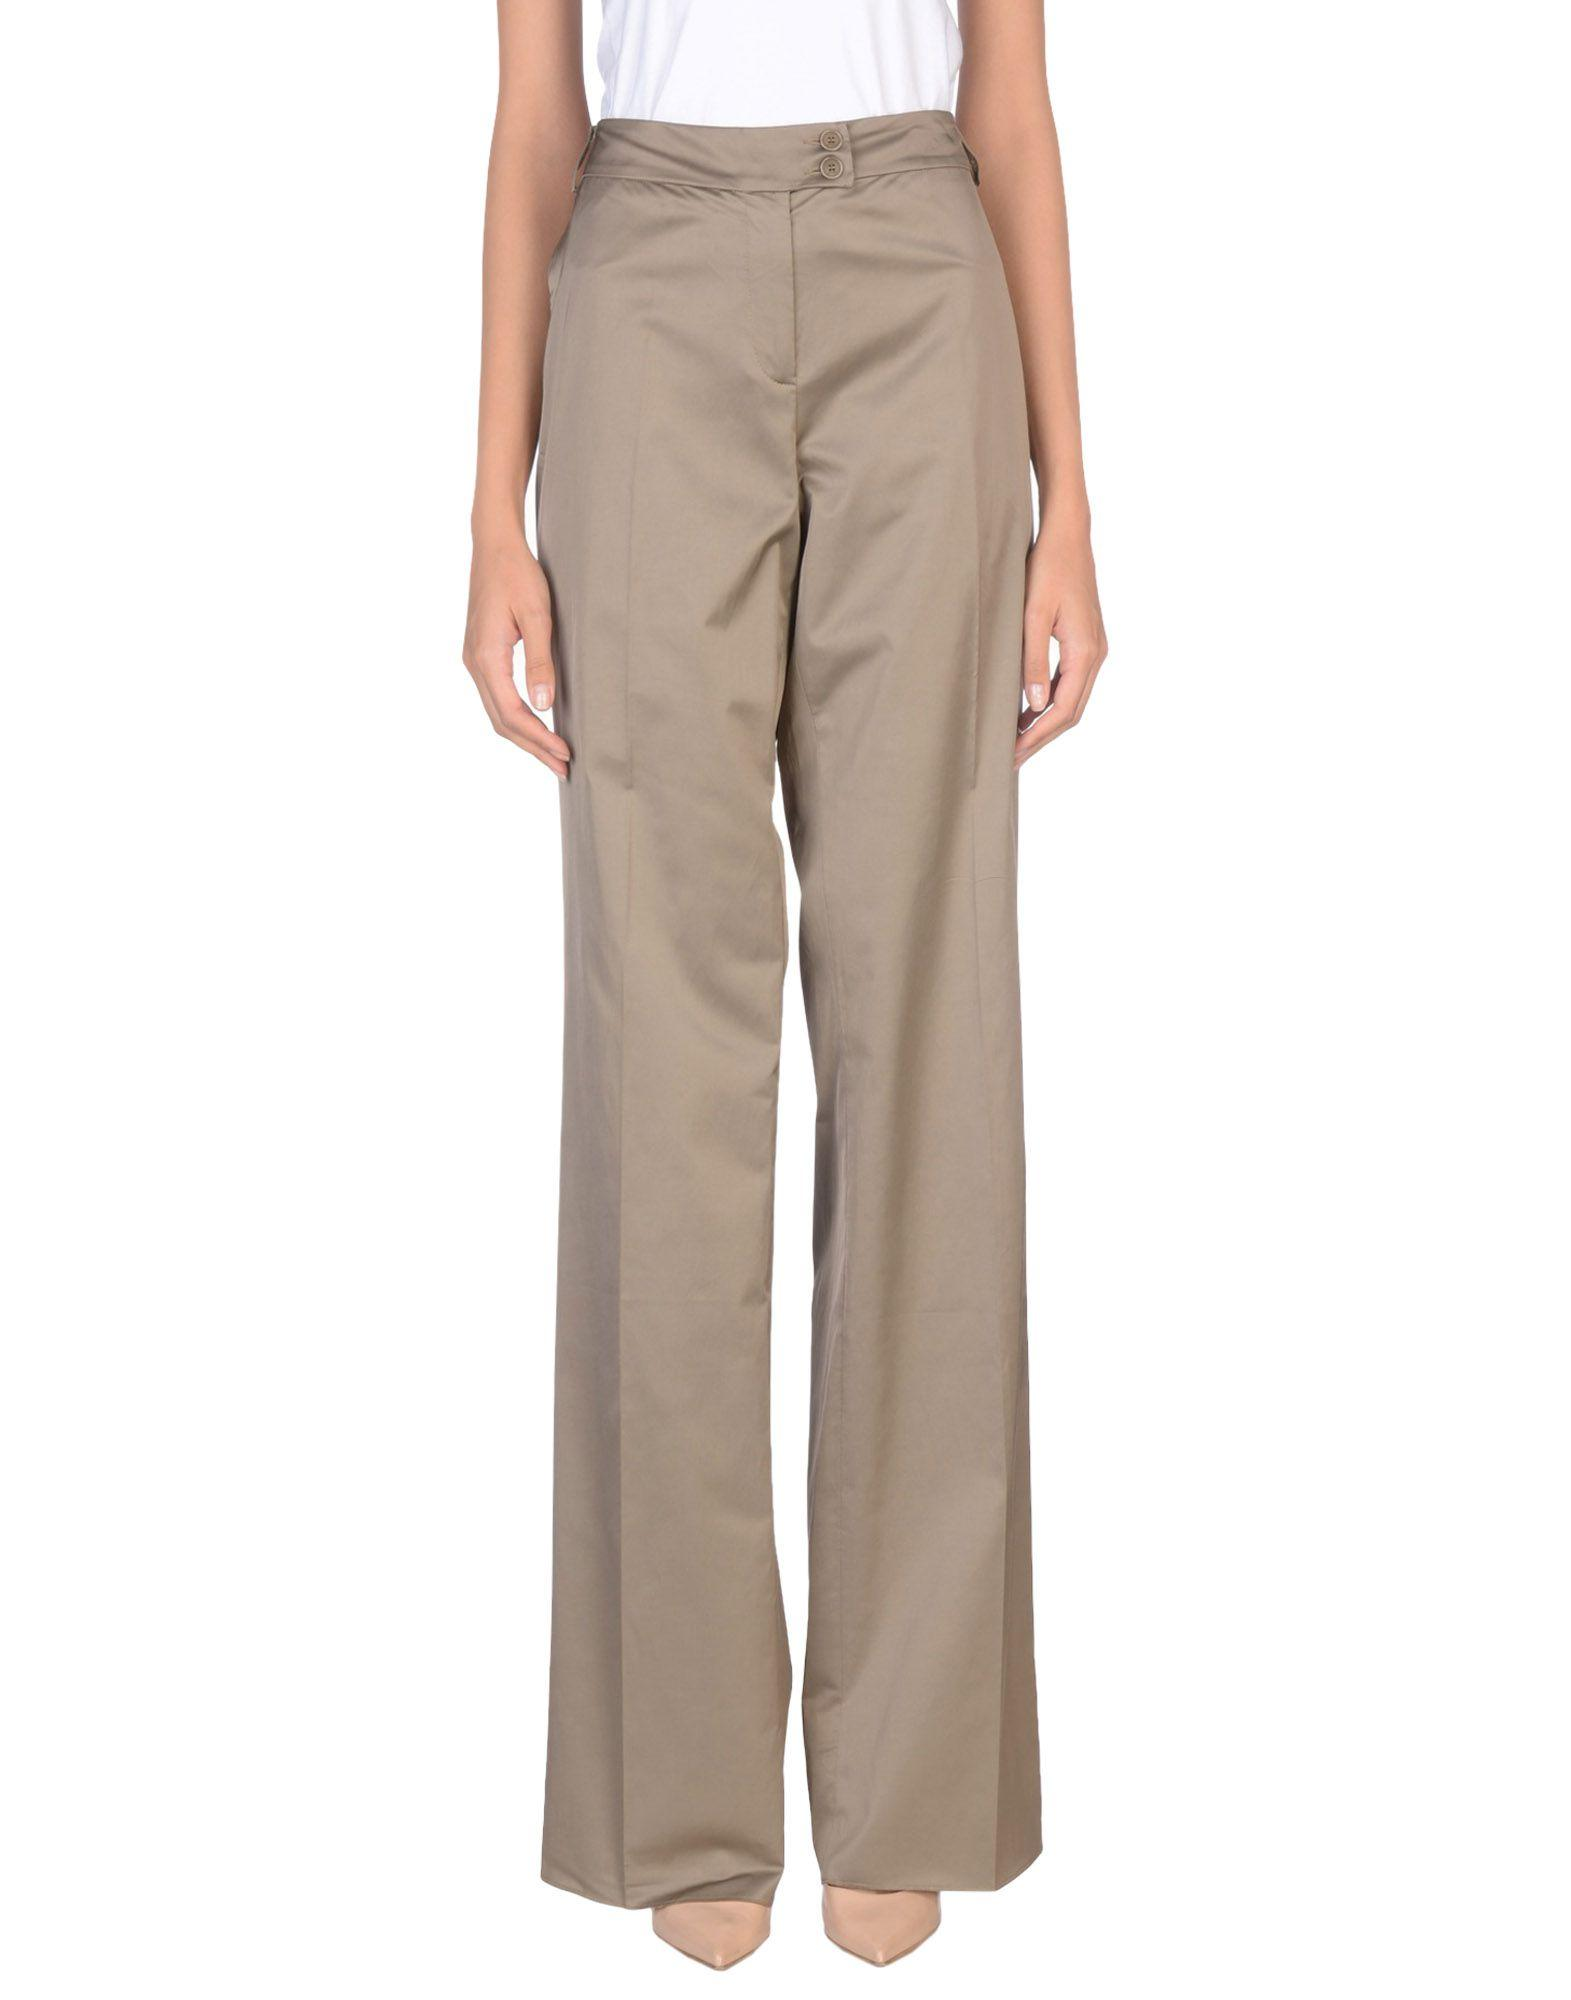 Etro Casual Pants In Khaki